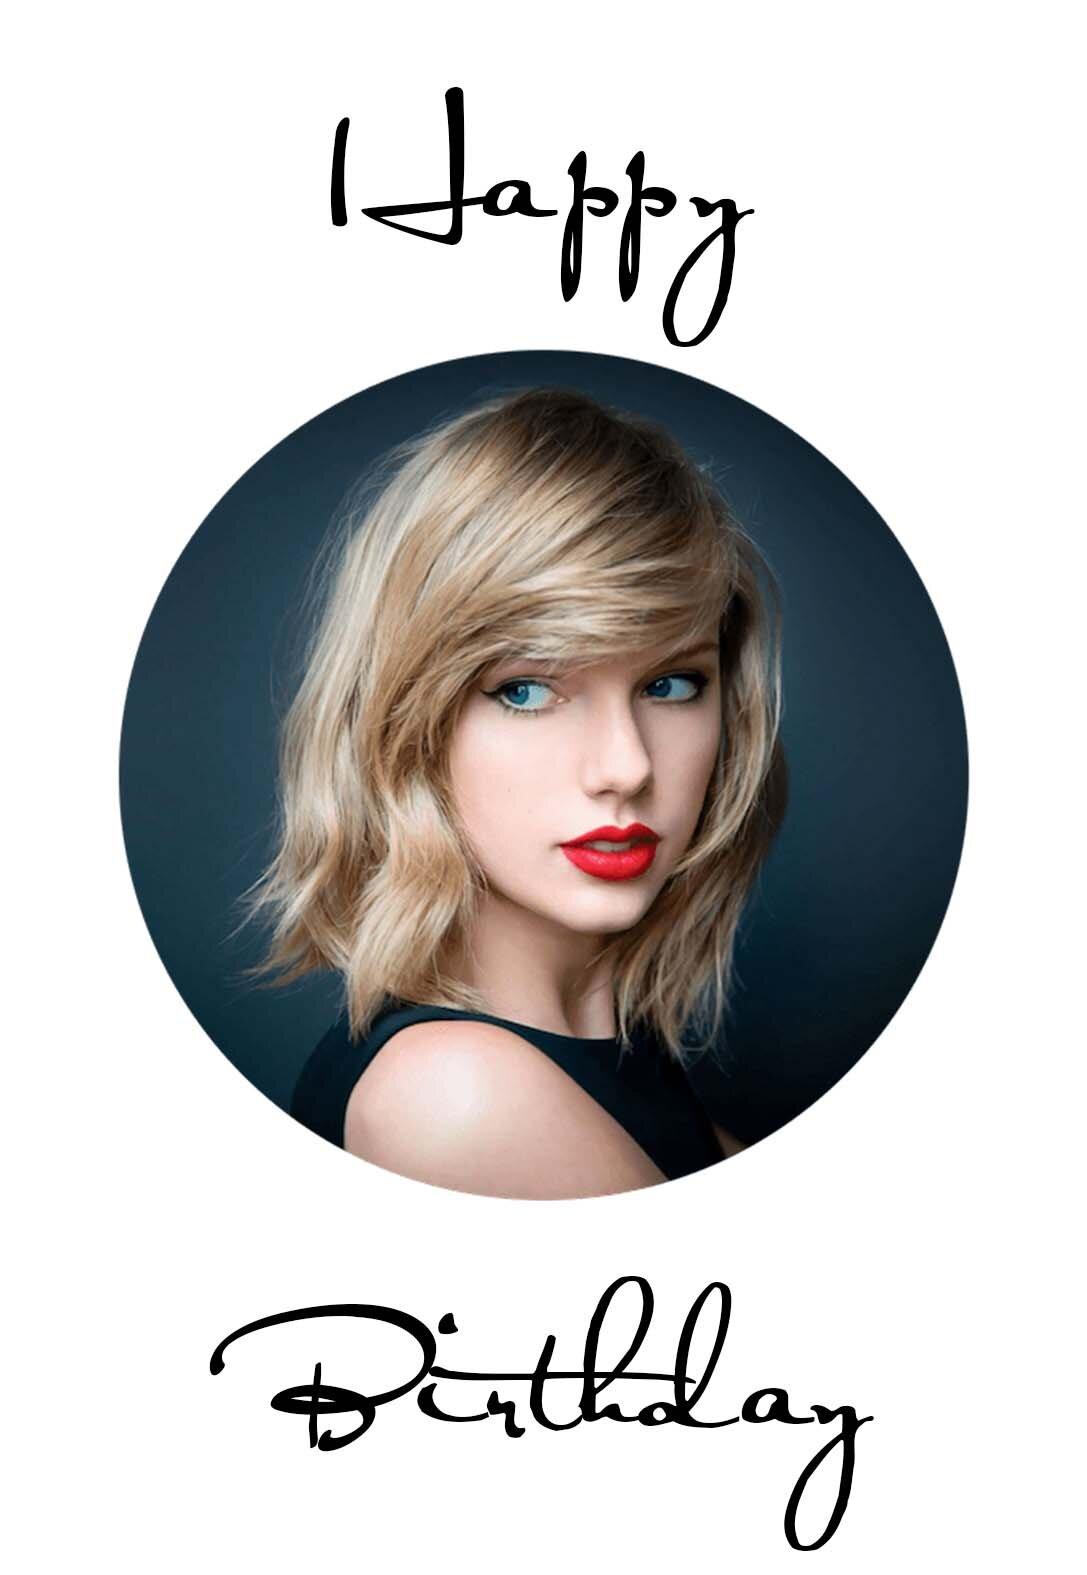 Taylor Swift Printable Birthday Cards Printbirthday Cards